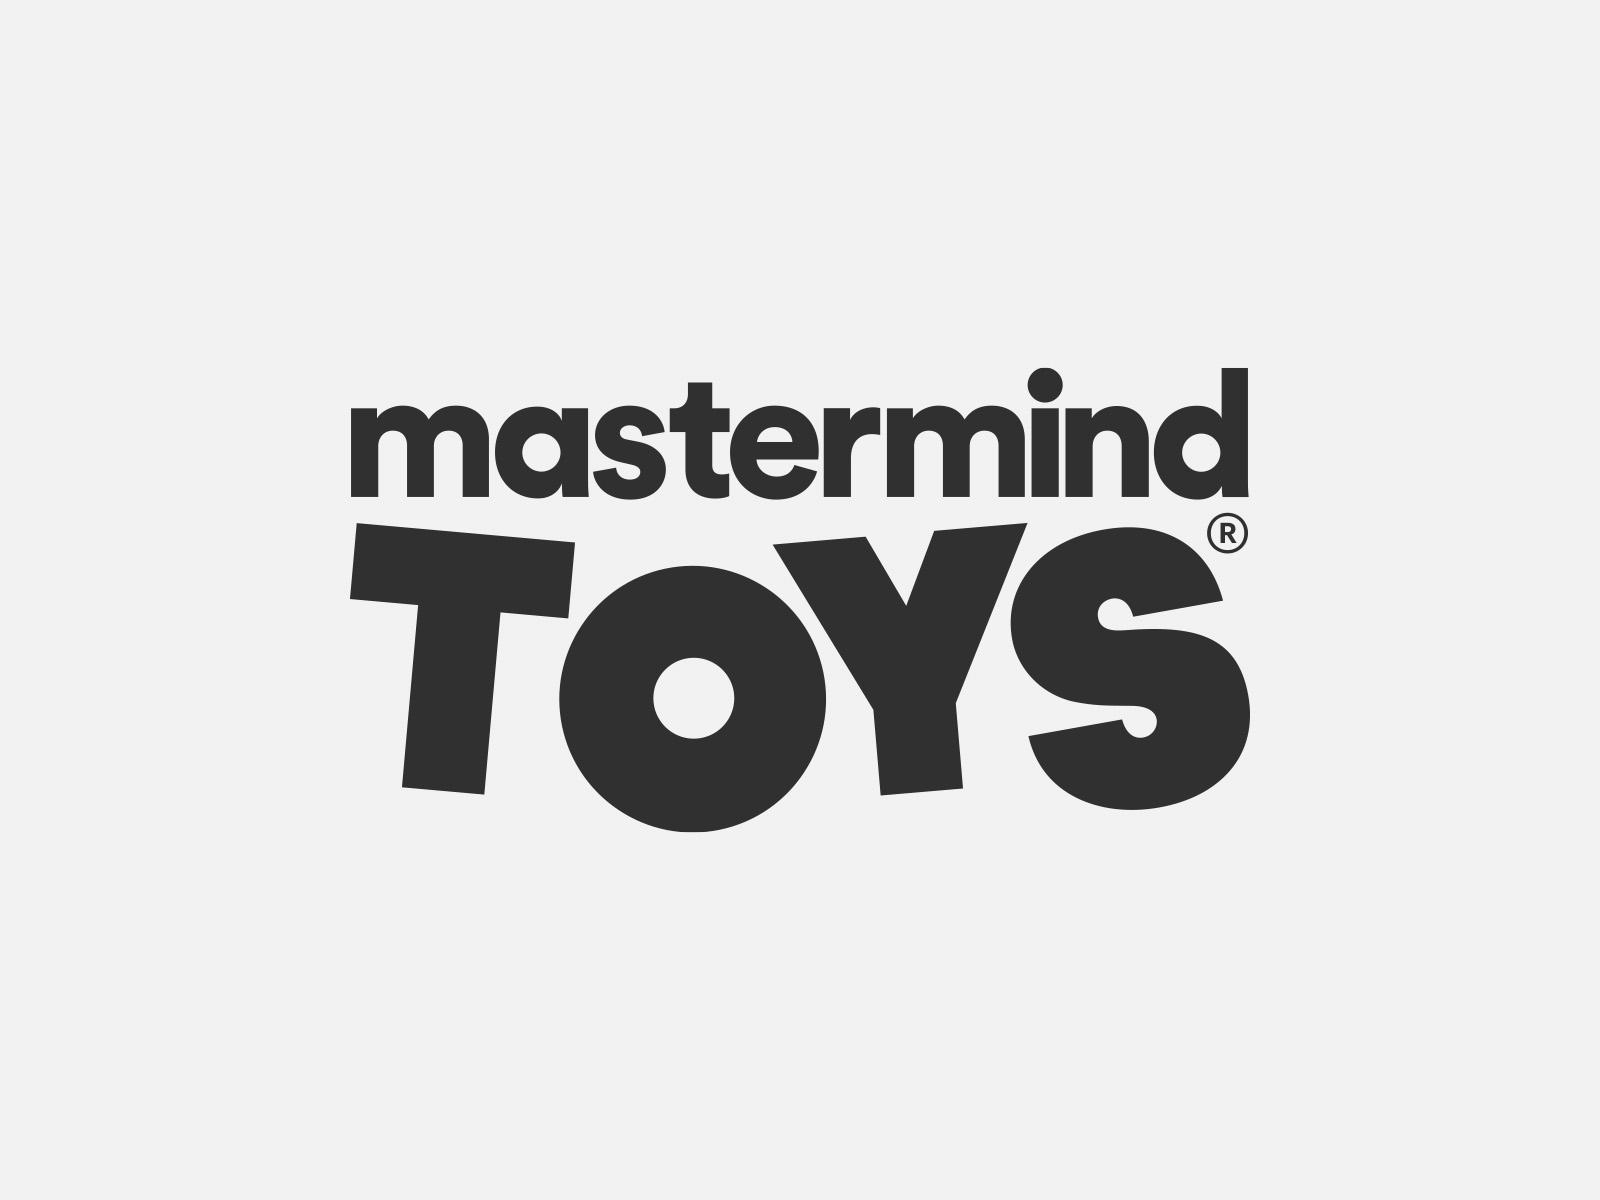 Mastermind Toys by Leo Burnett Design